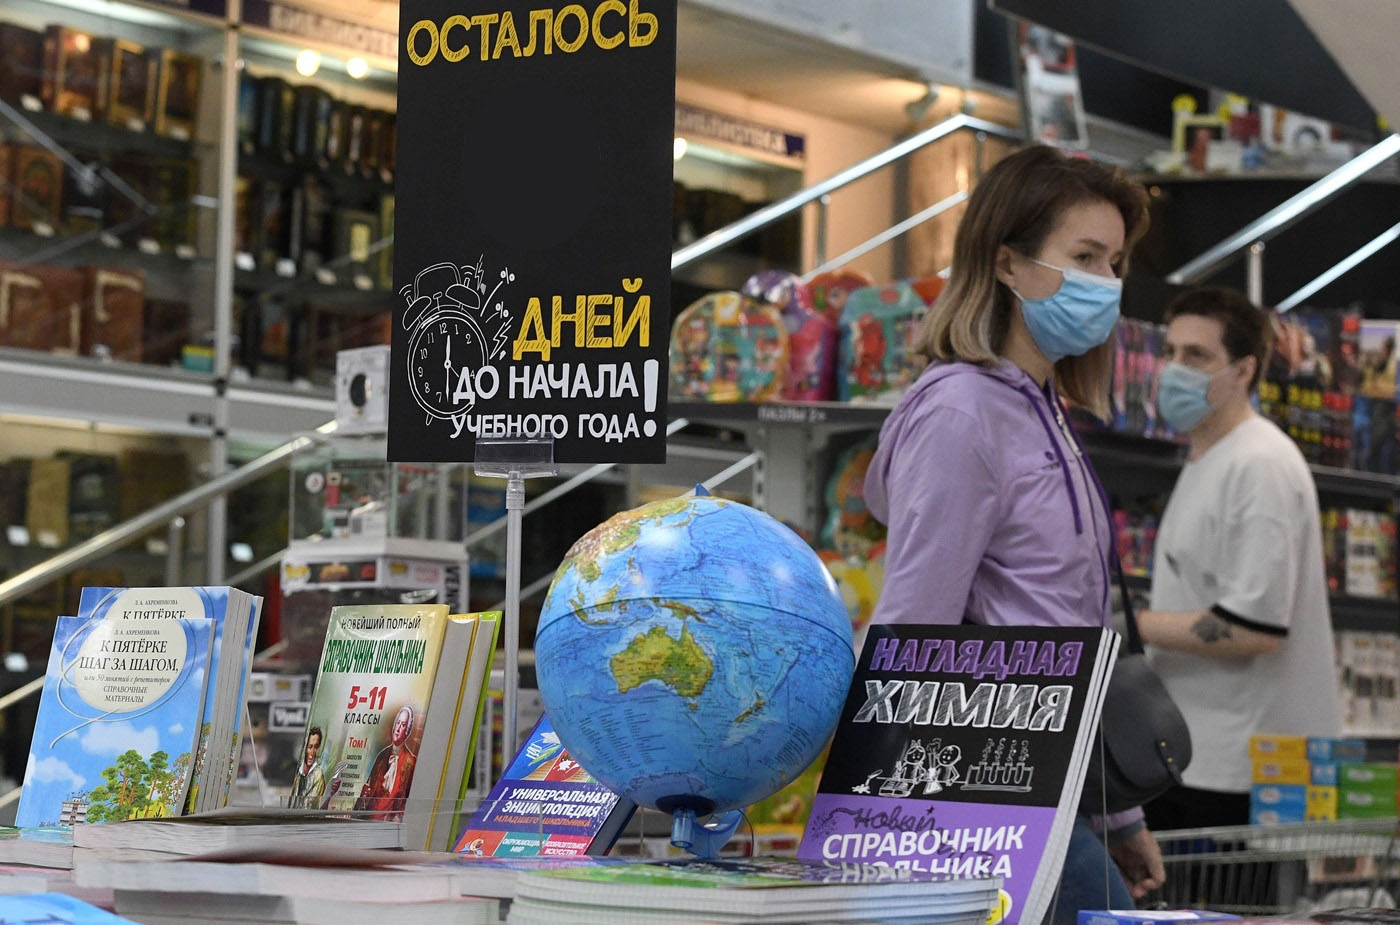 автор фотоАлександр Казаков/Коммерсантъ